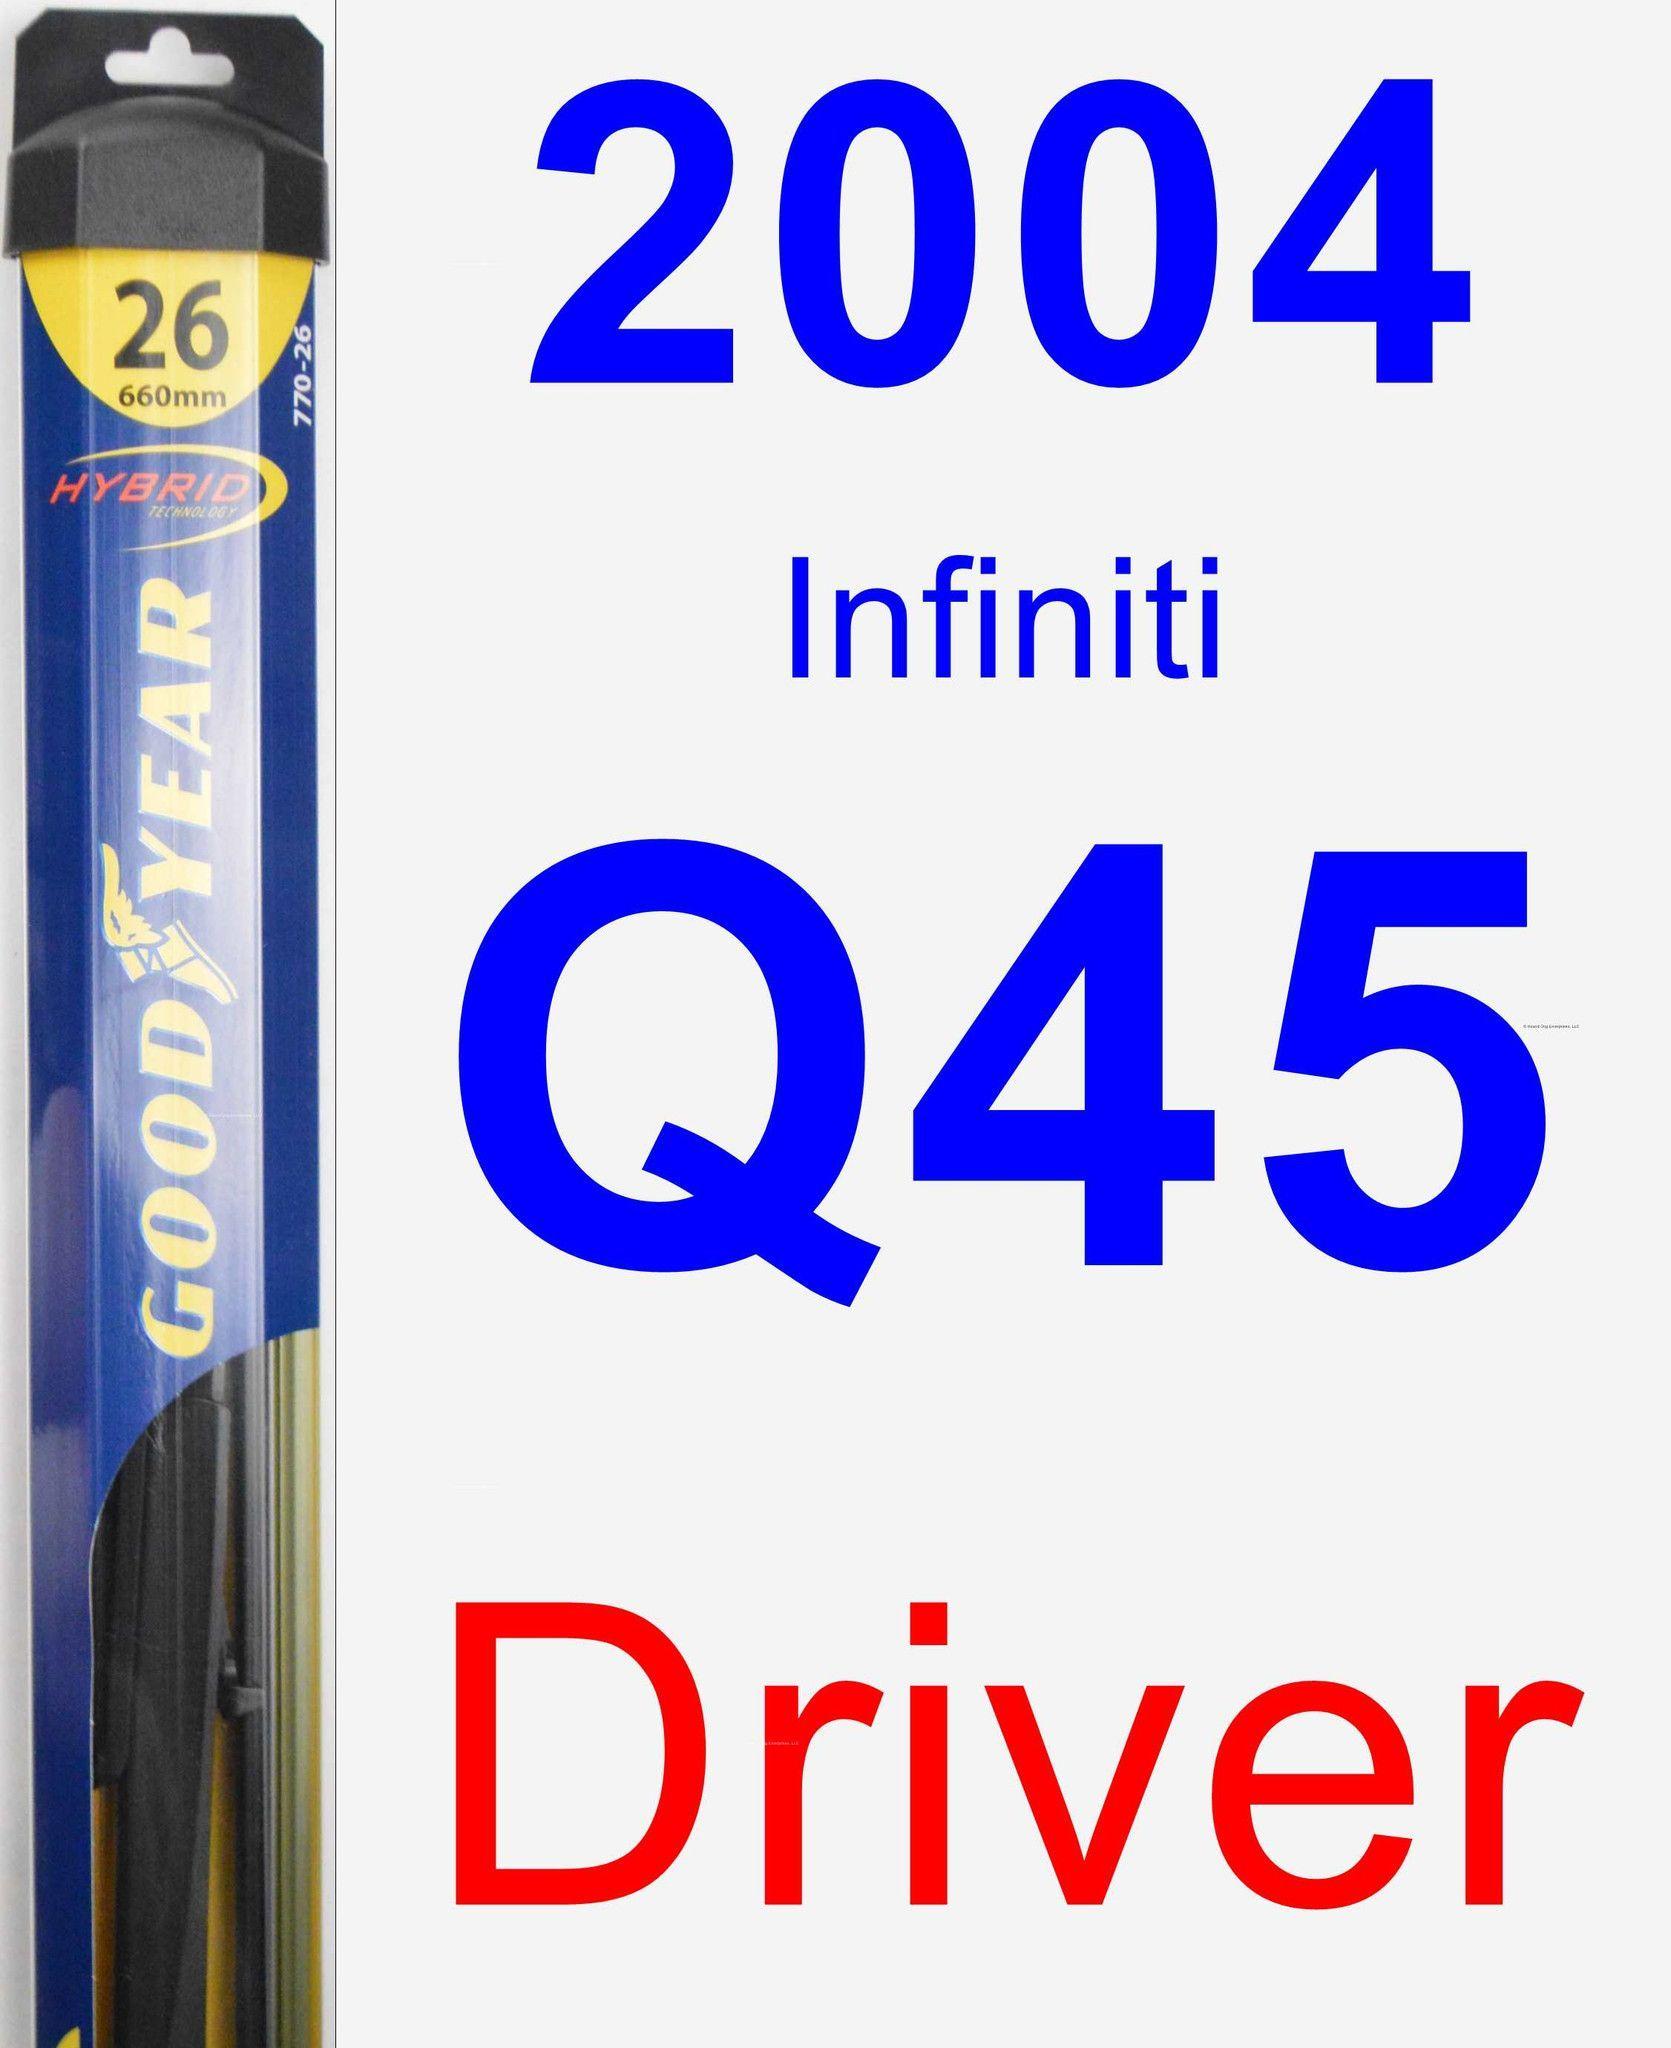 Driver Wiper Blade For 2004 Infiniti Q45 - Hybrid